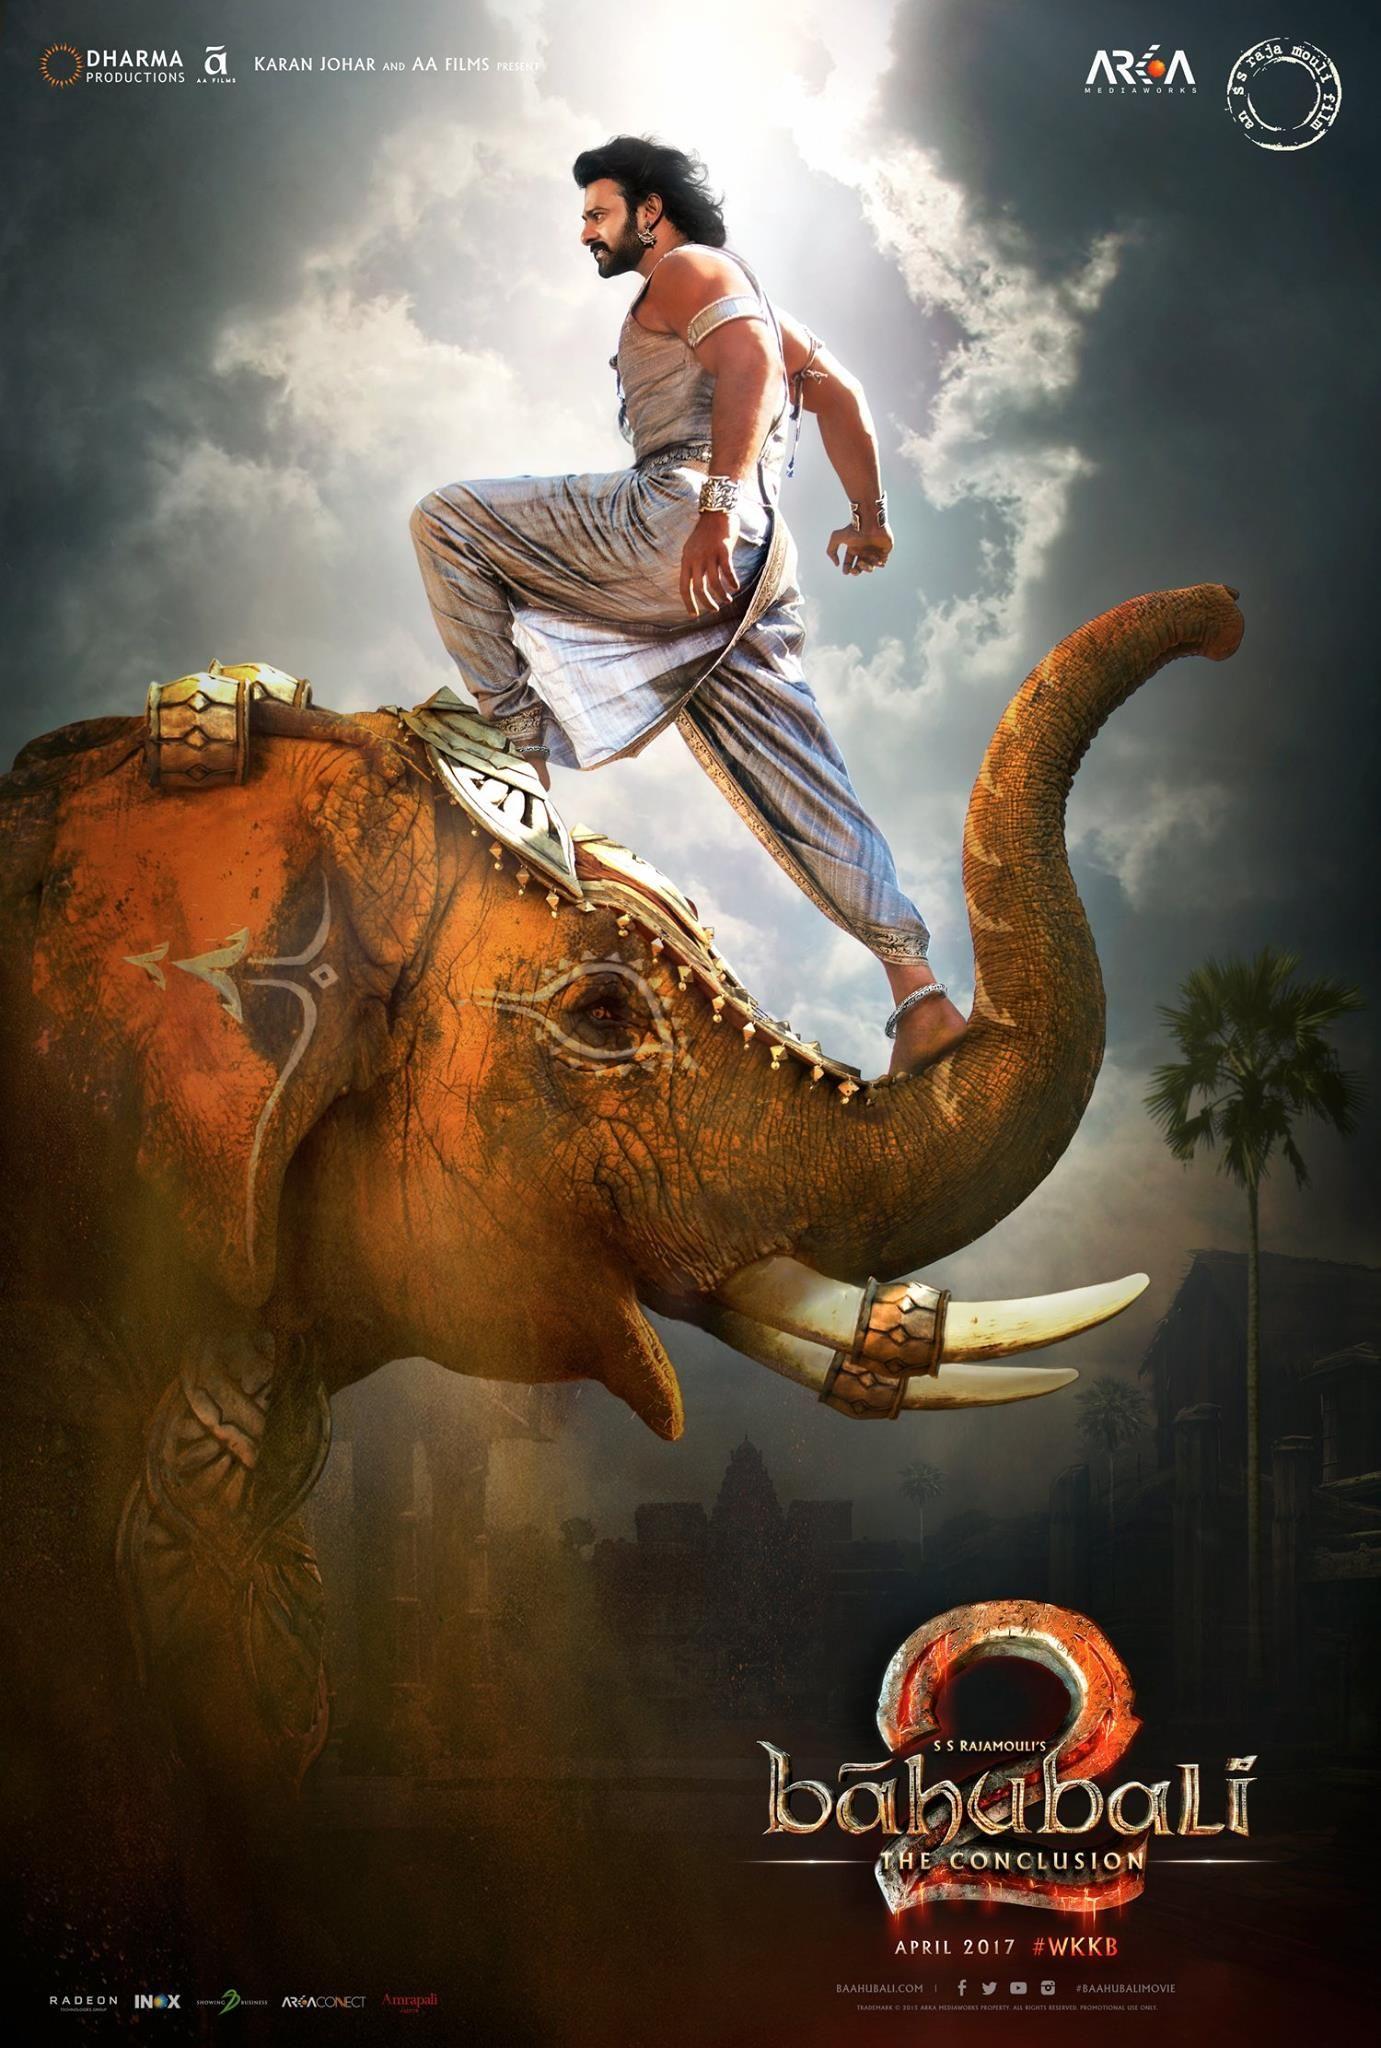 download baahubali 1 full movie in hindi